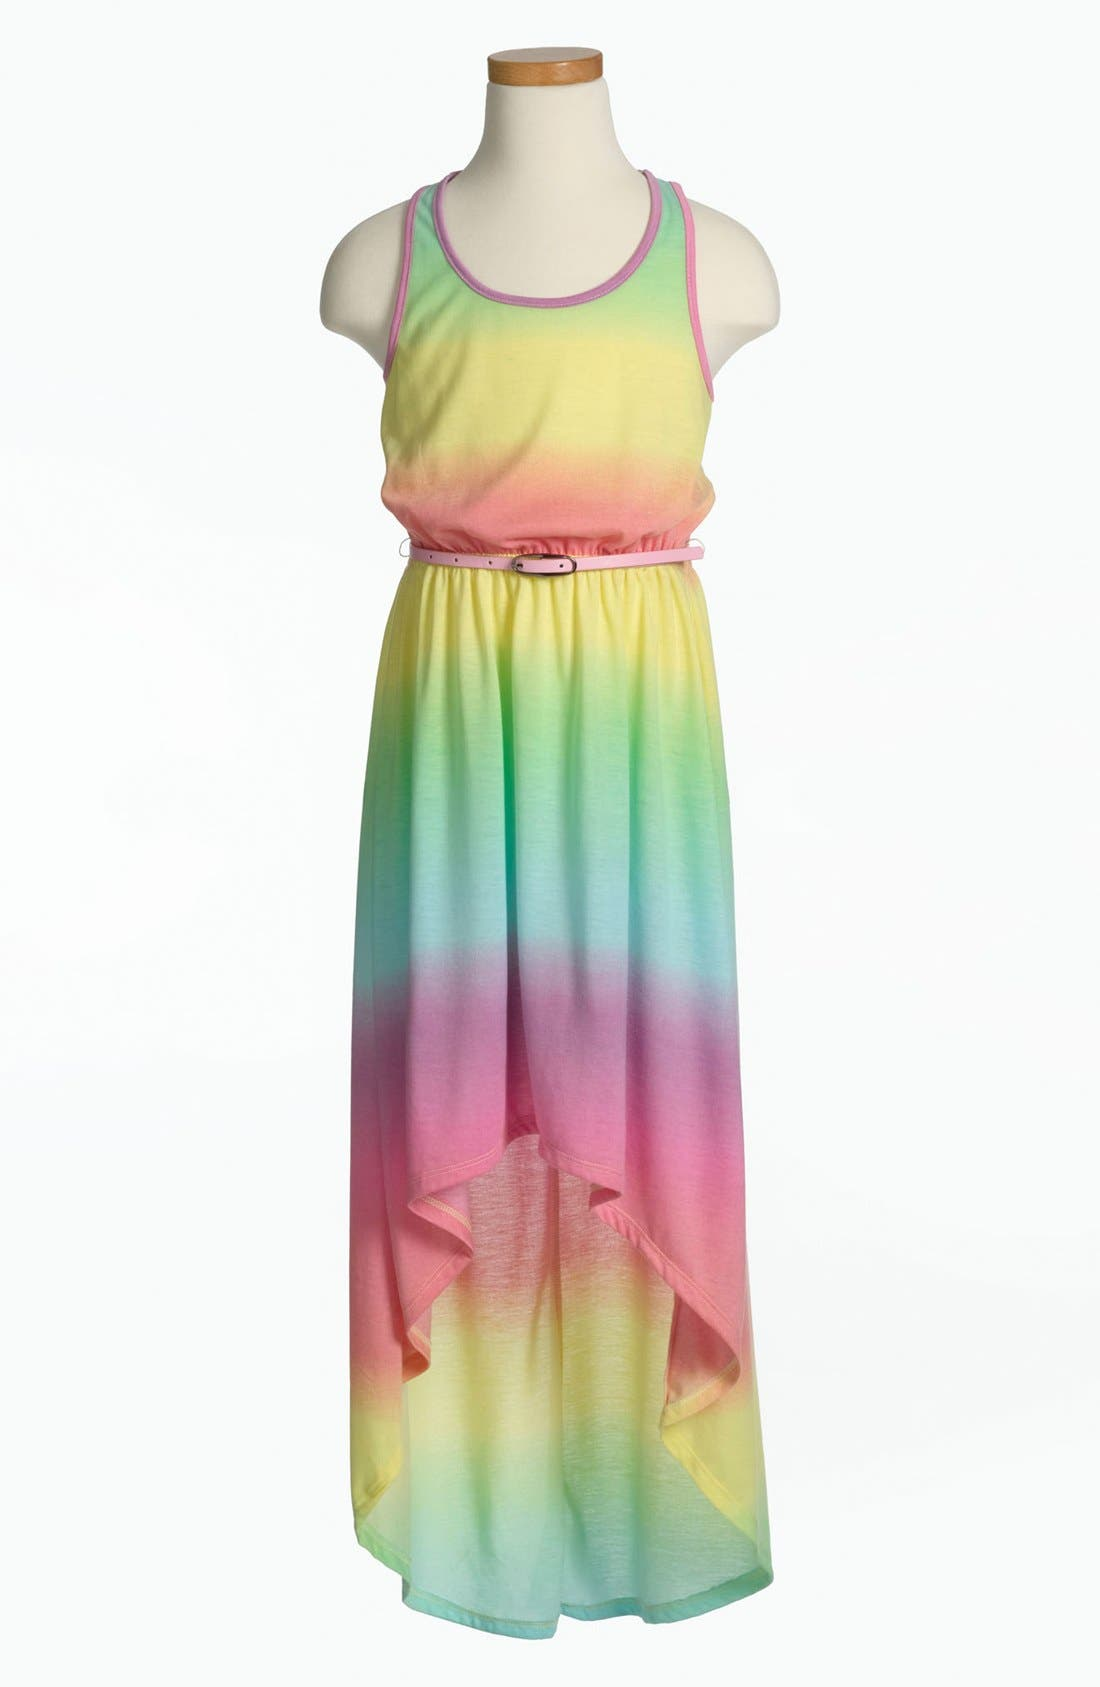 Main Image - Fire Tie Dye Dress (Little Girls & Big Girls)